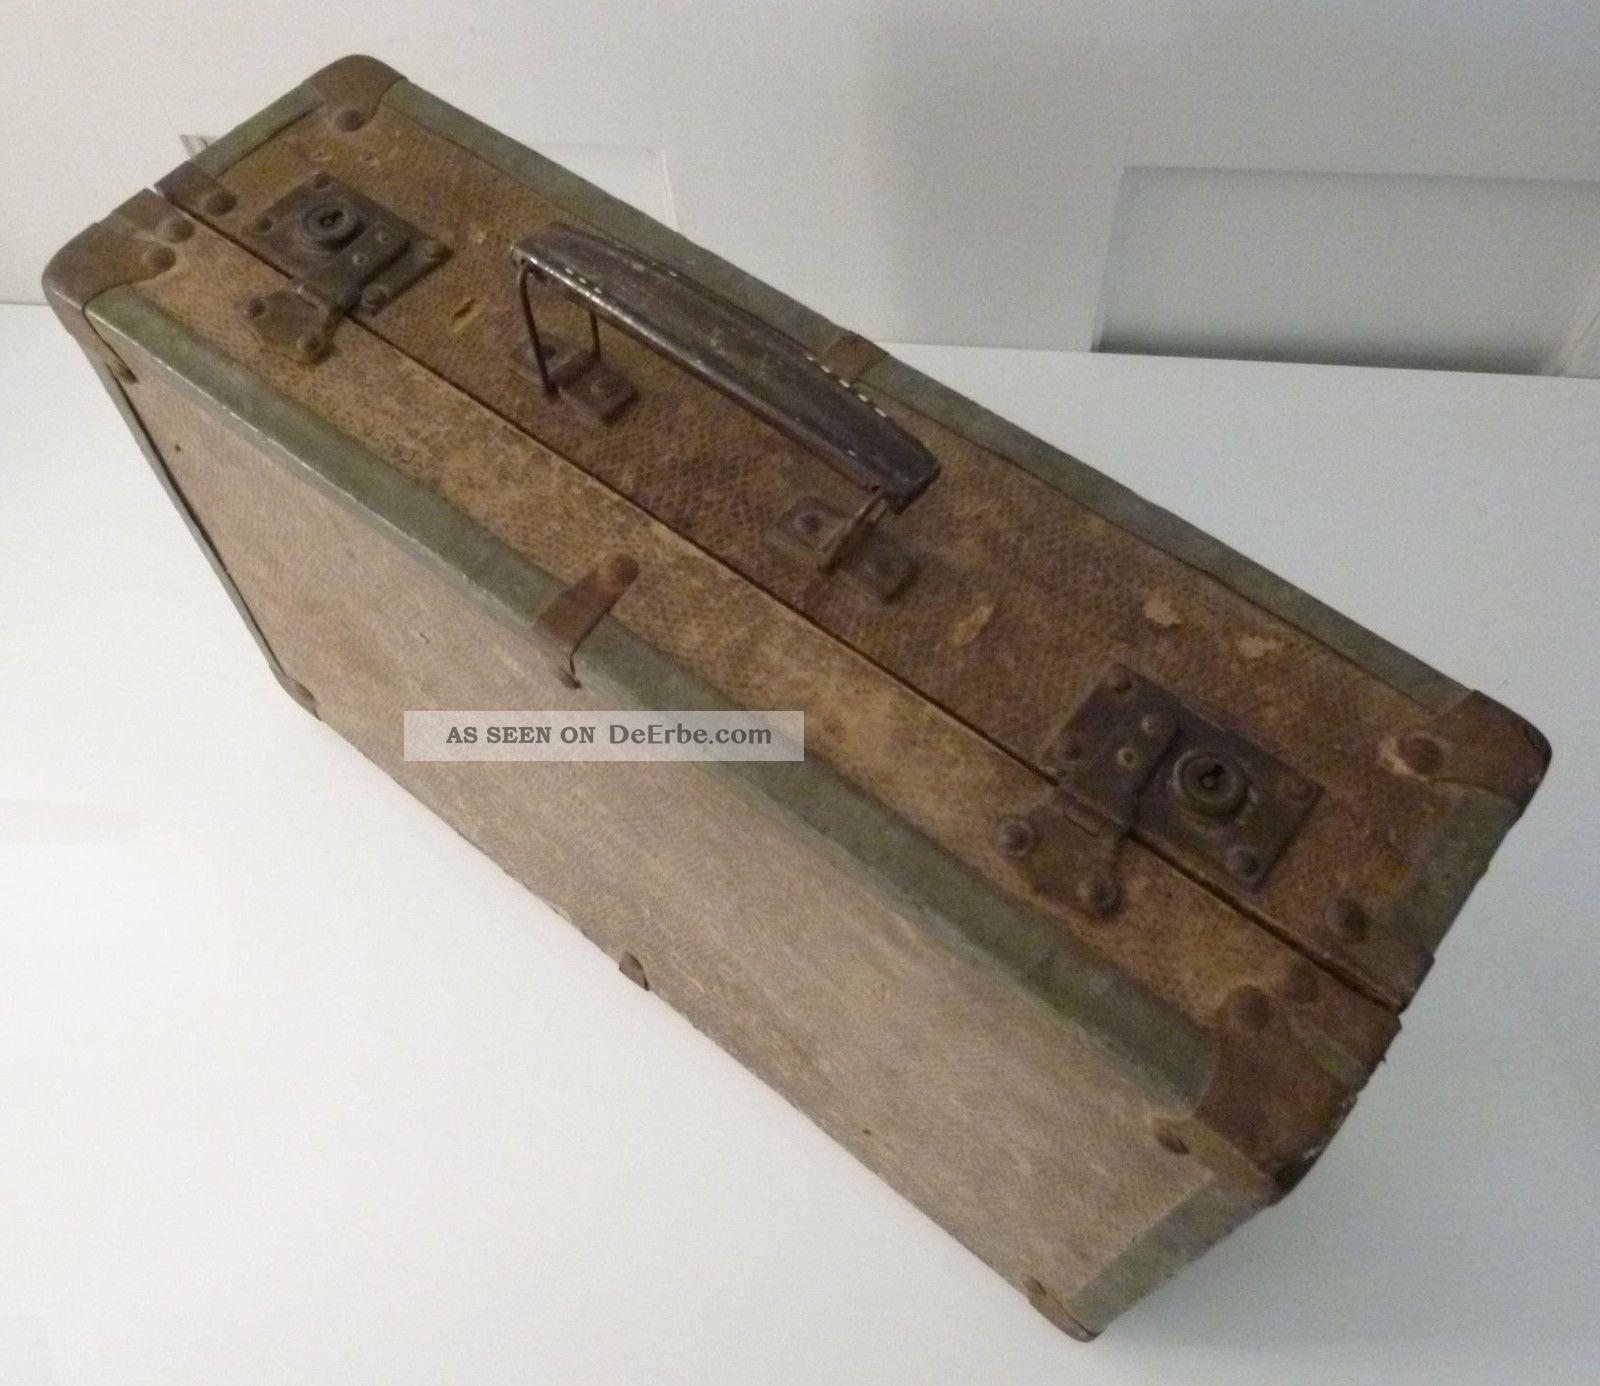 kleiner koffer holz metall kroko look metall papier. Black Bedroom Furniture Sets. Home Design Ideas